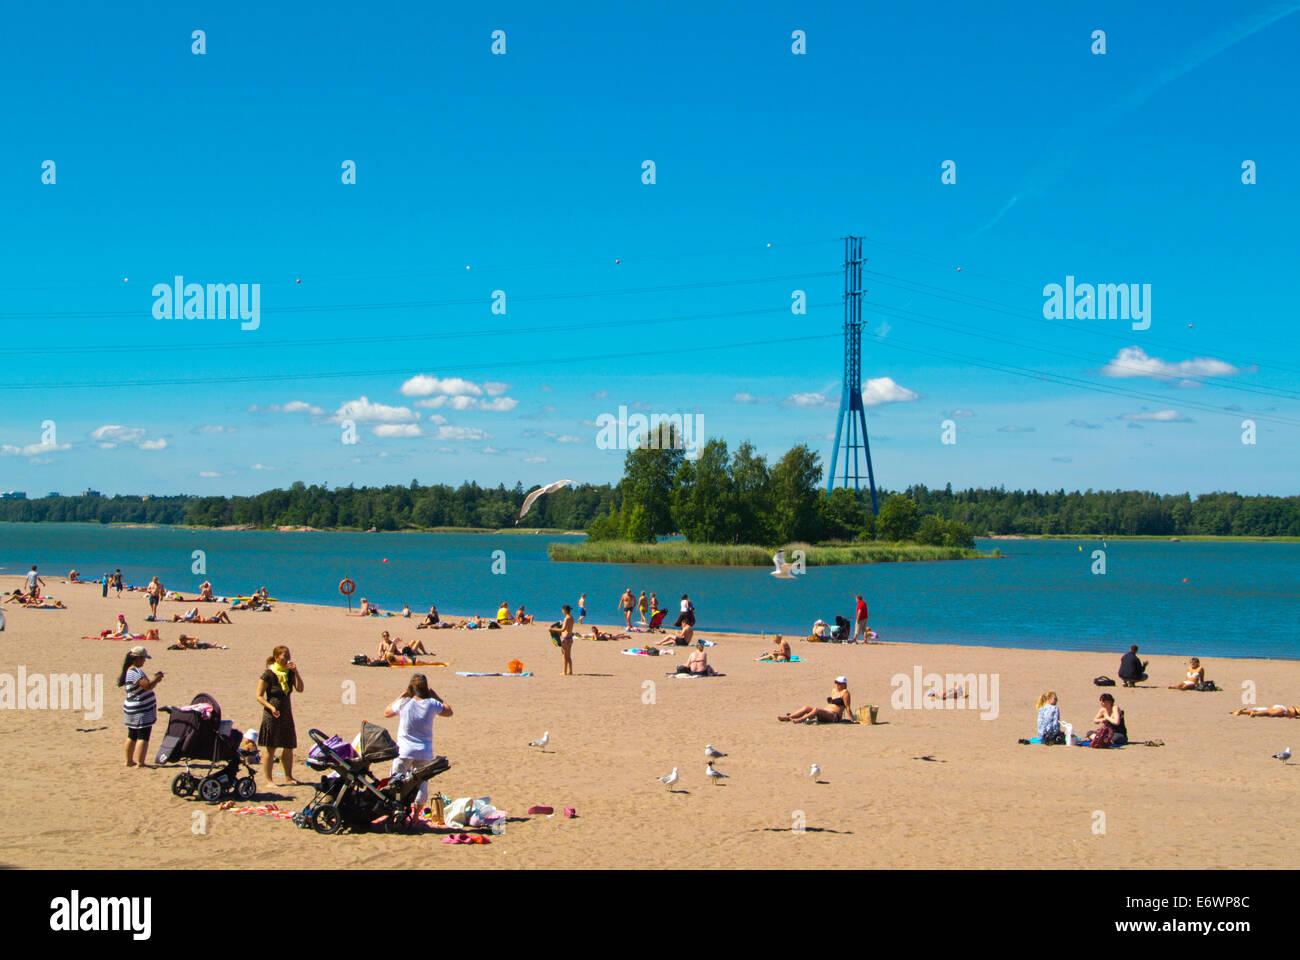 Hietaniemen hiekkaranta, sand beach at Hietaniemi bay, Töölö district, Helsinki, Finland, Europe - Stock Image